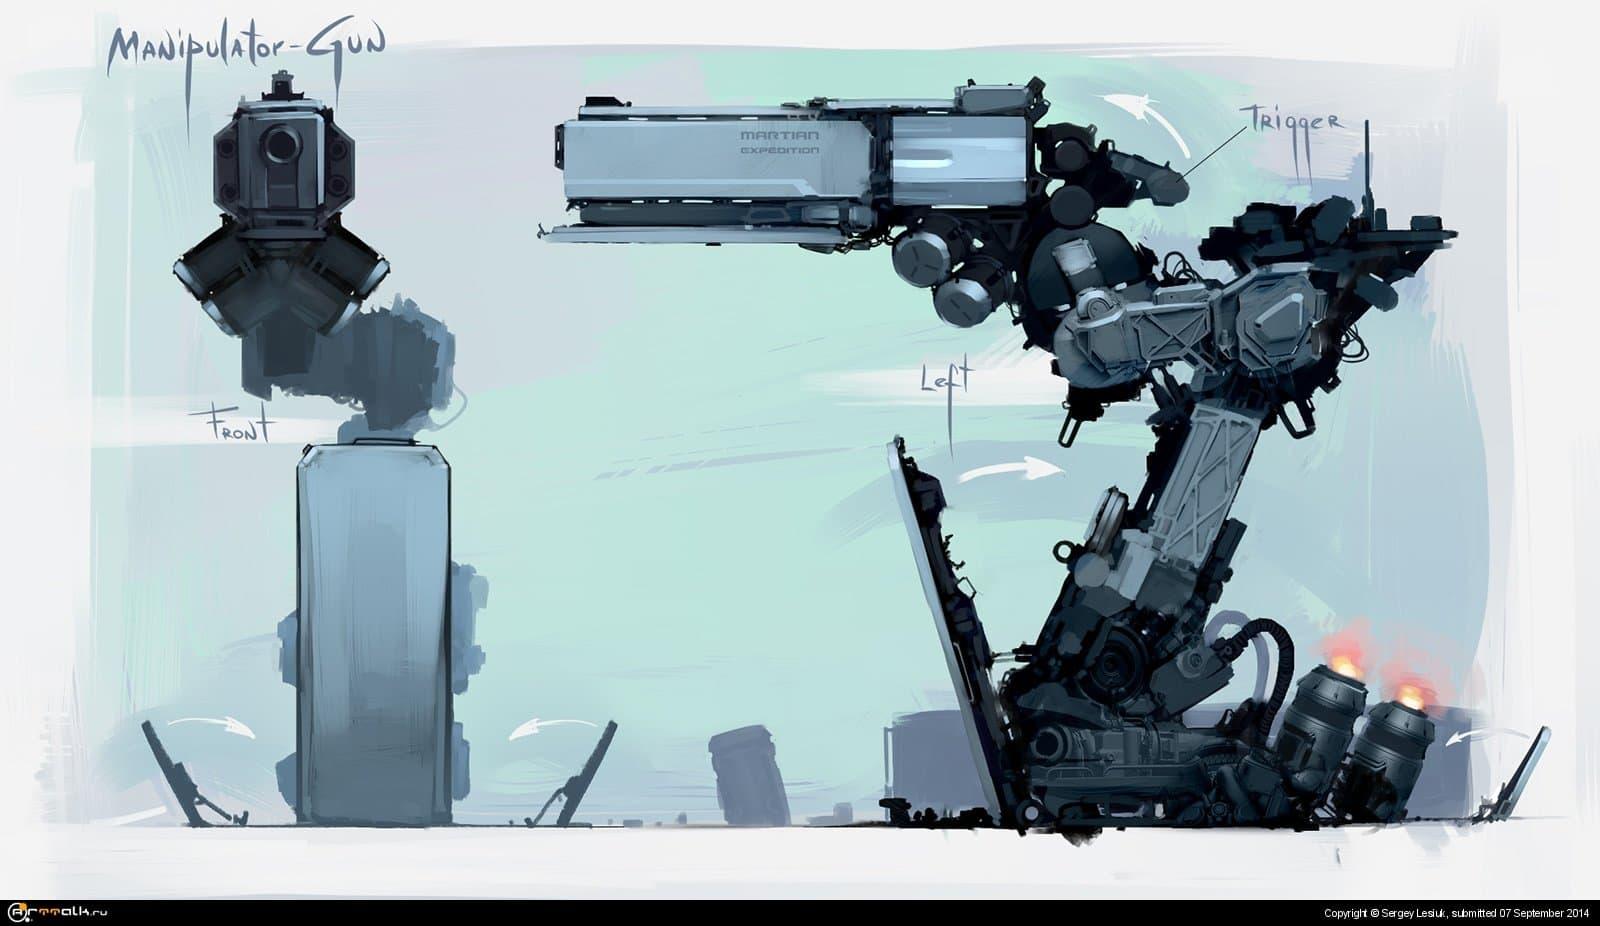 Manipulator Gun